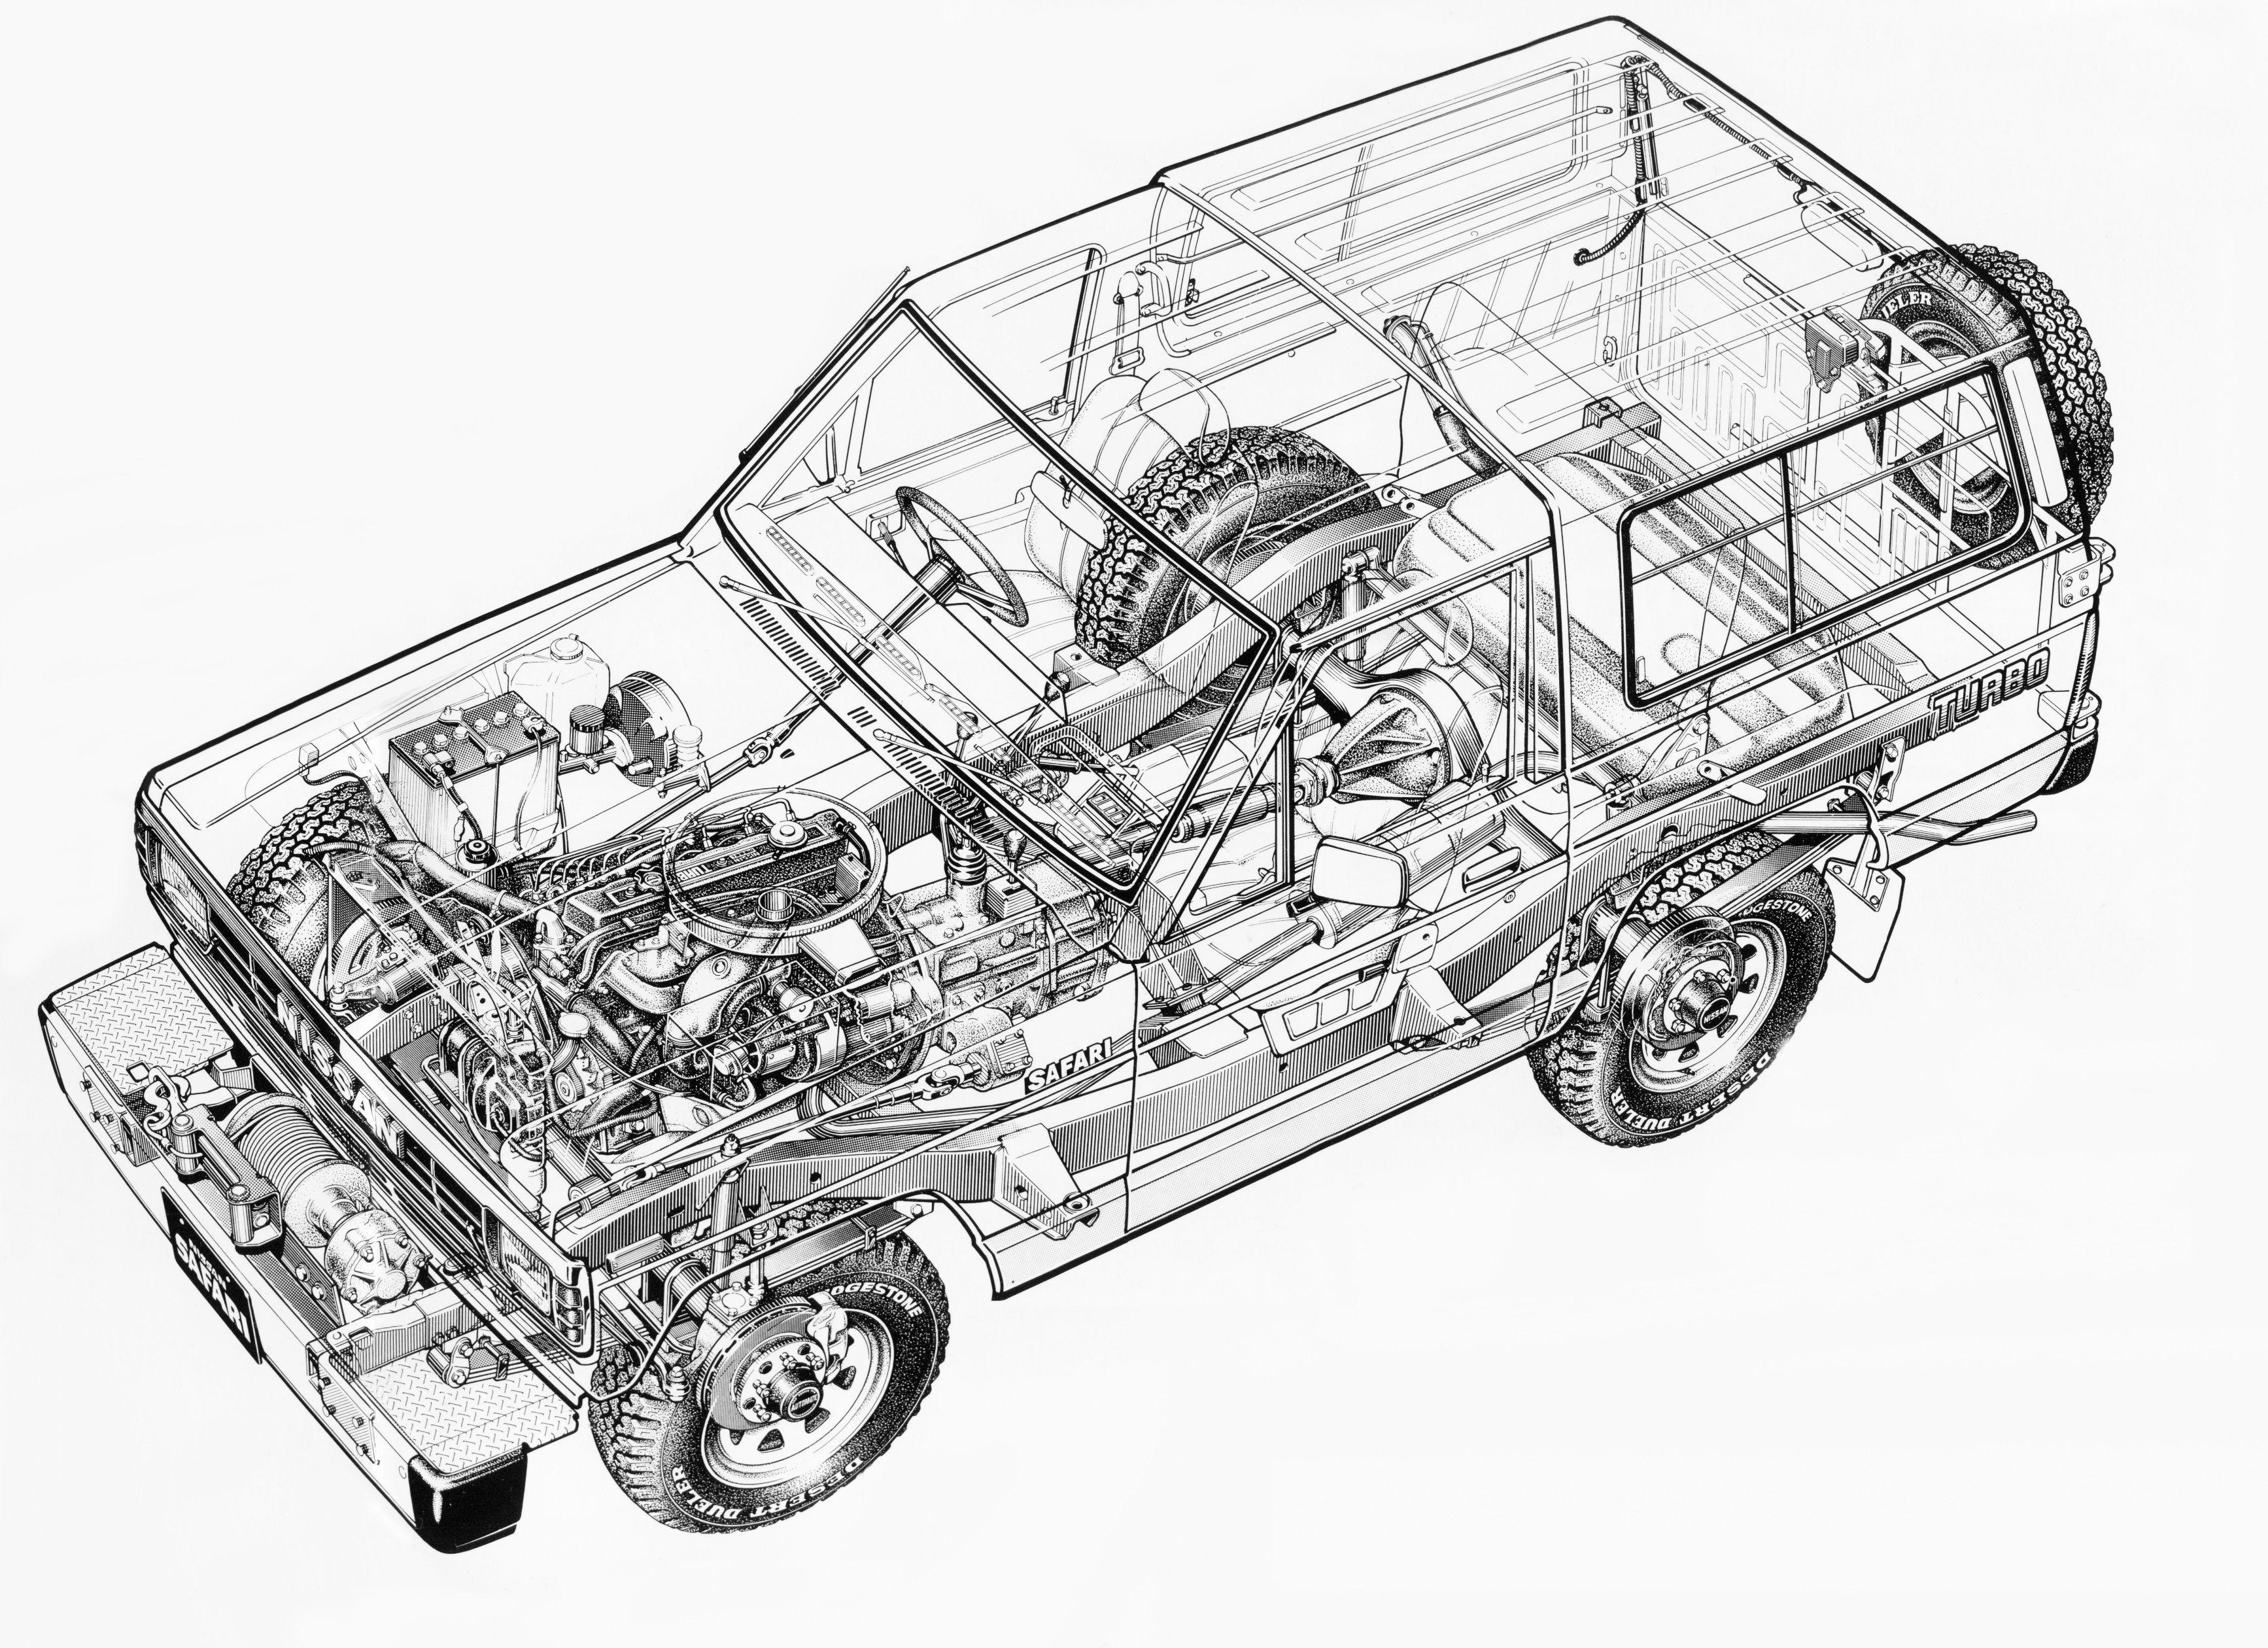 87 Nissan Safari Hard Top Model 161